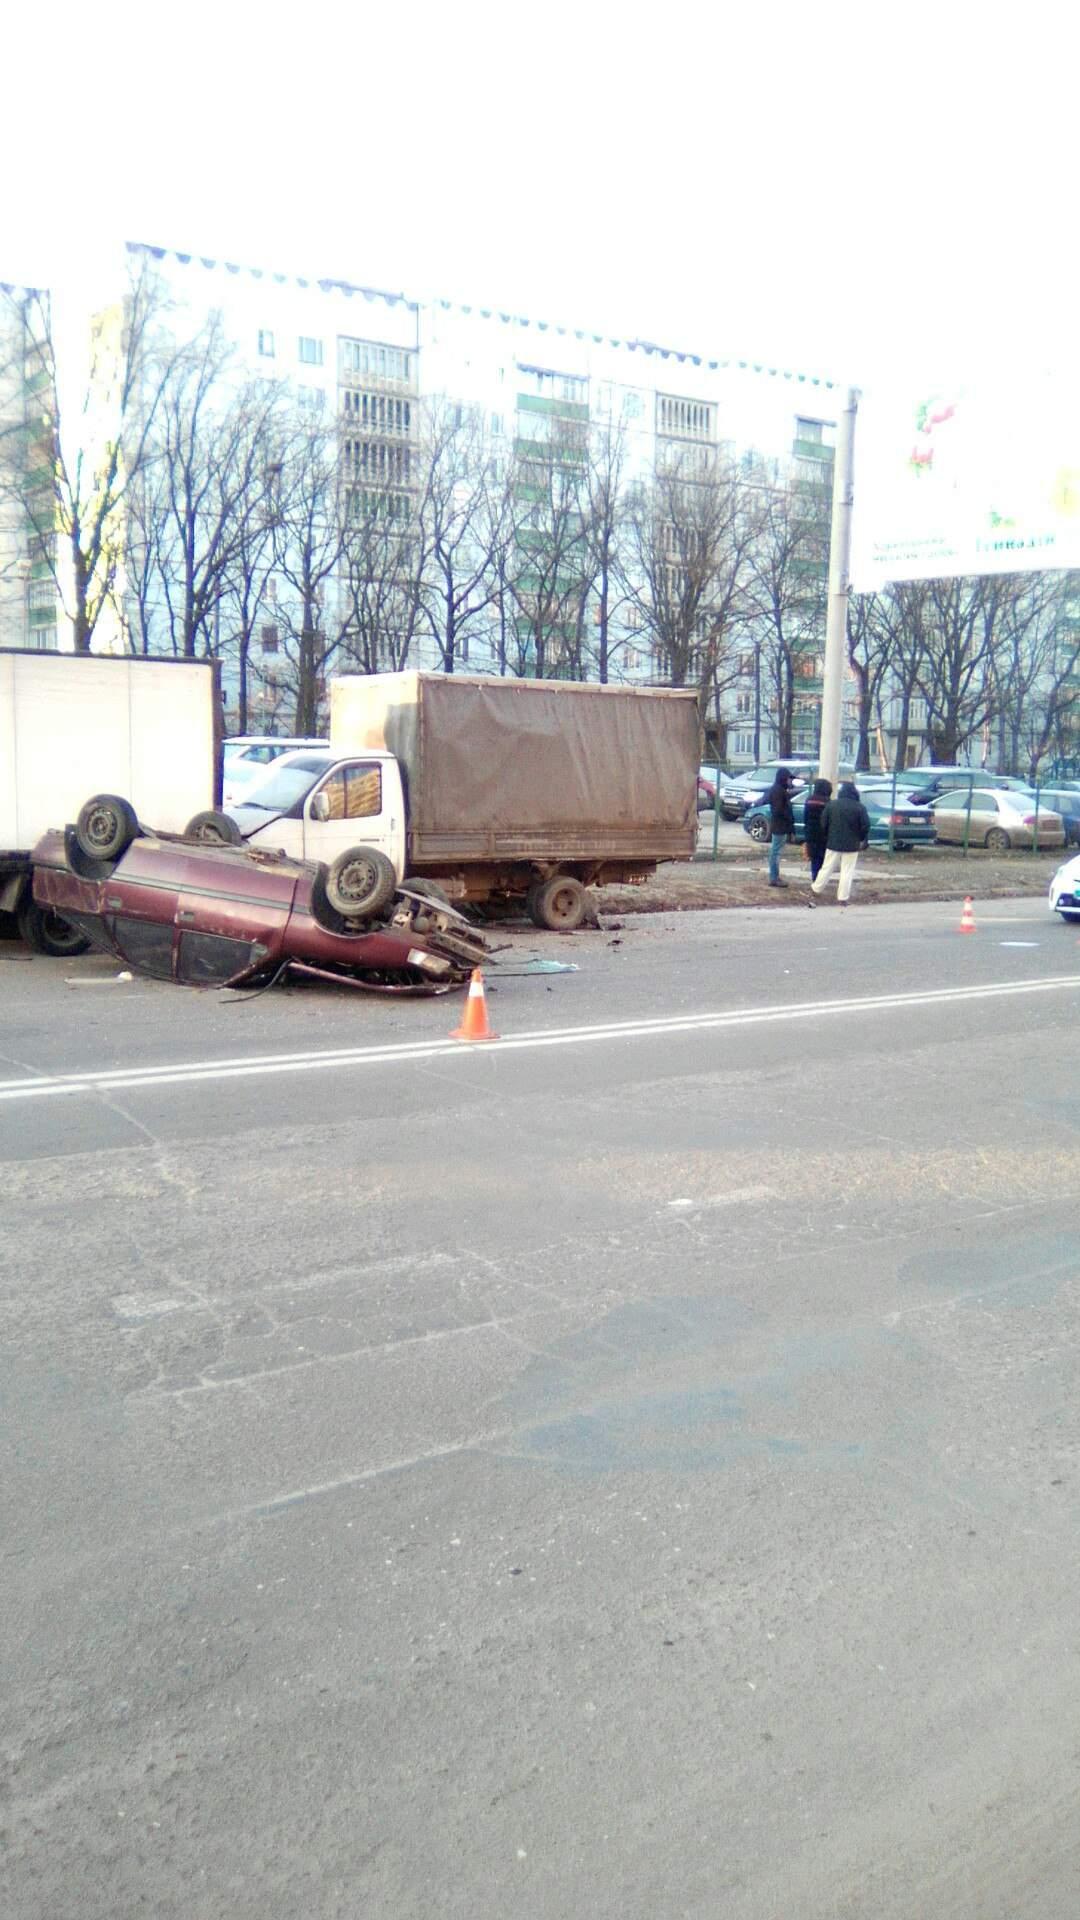 В Харькове произошло ДТП с опрокидыванием (фото)